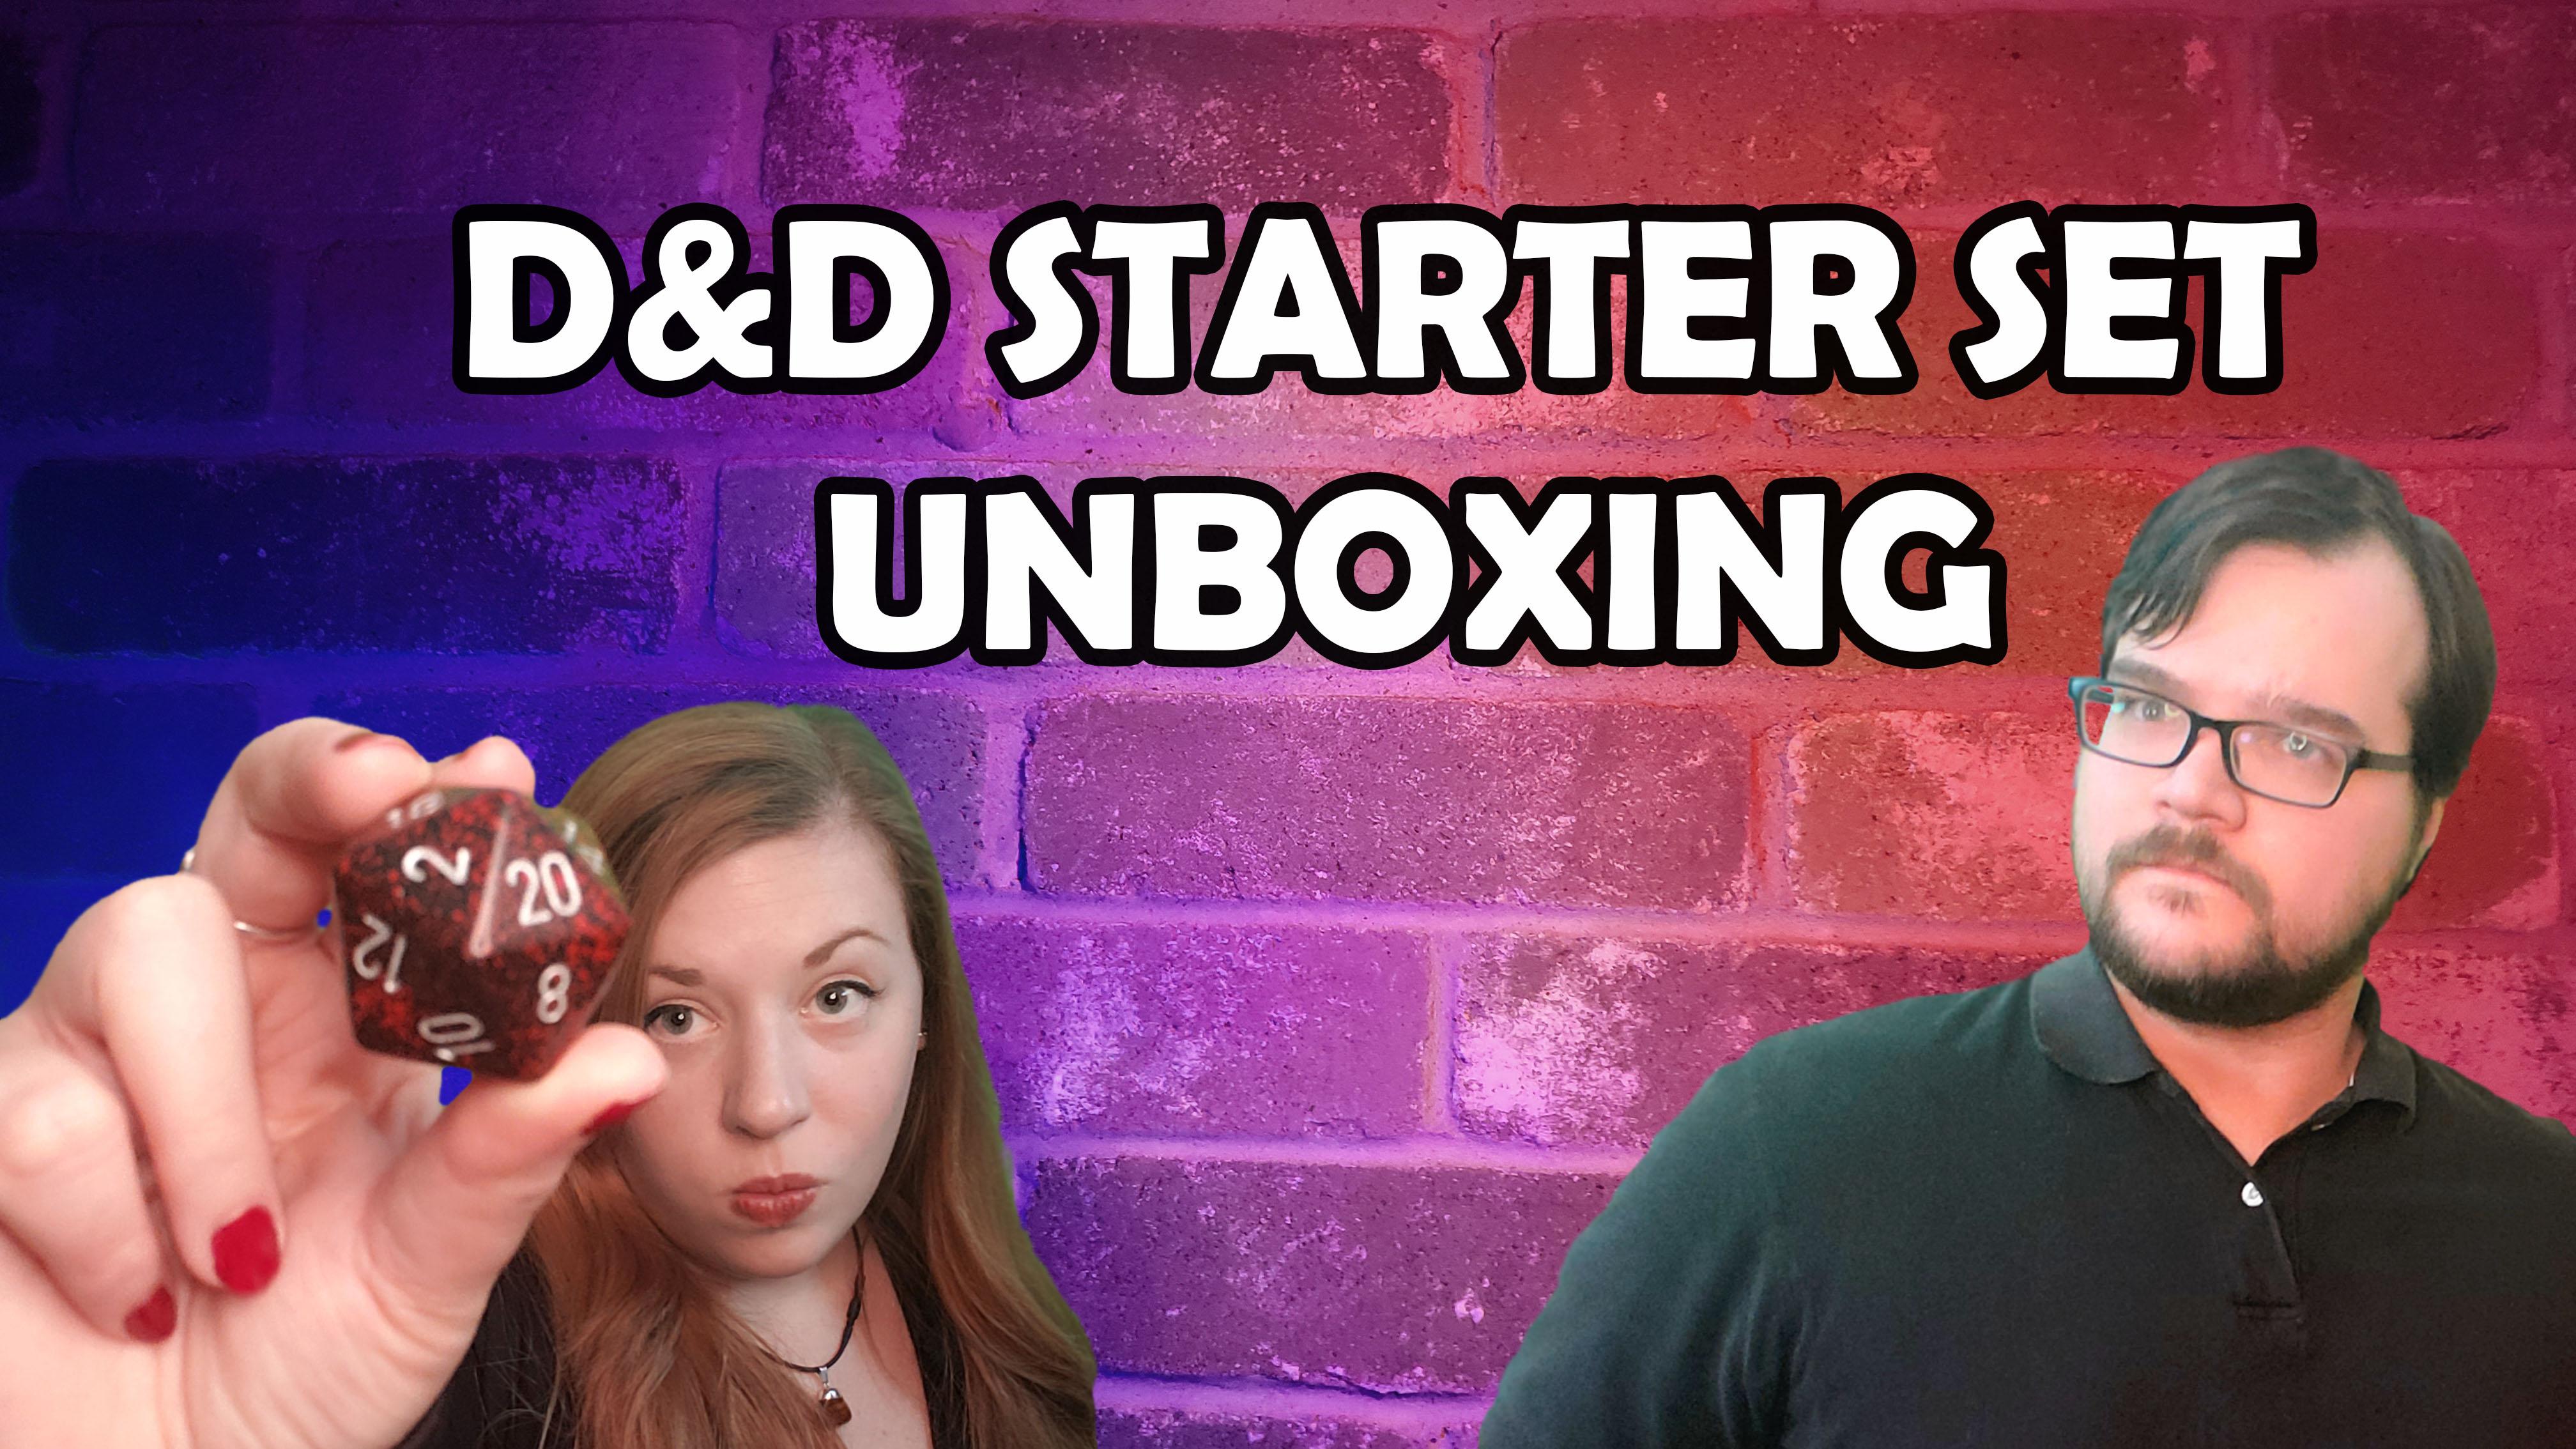 D&D Starter Kit Unboxing (How to DM 101 Part 2)